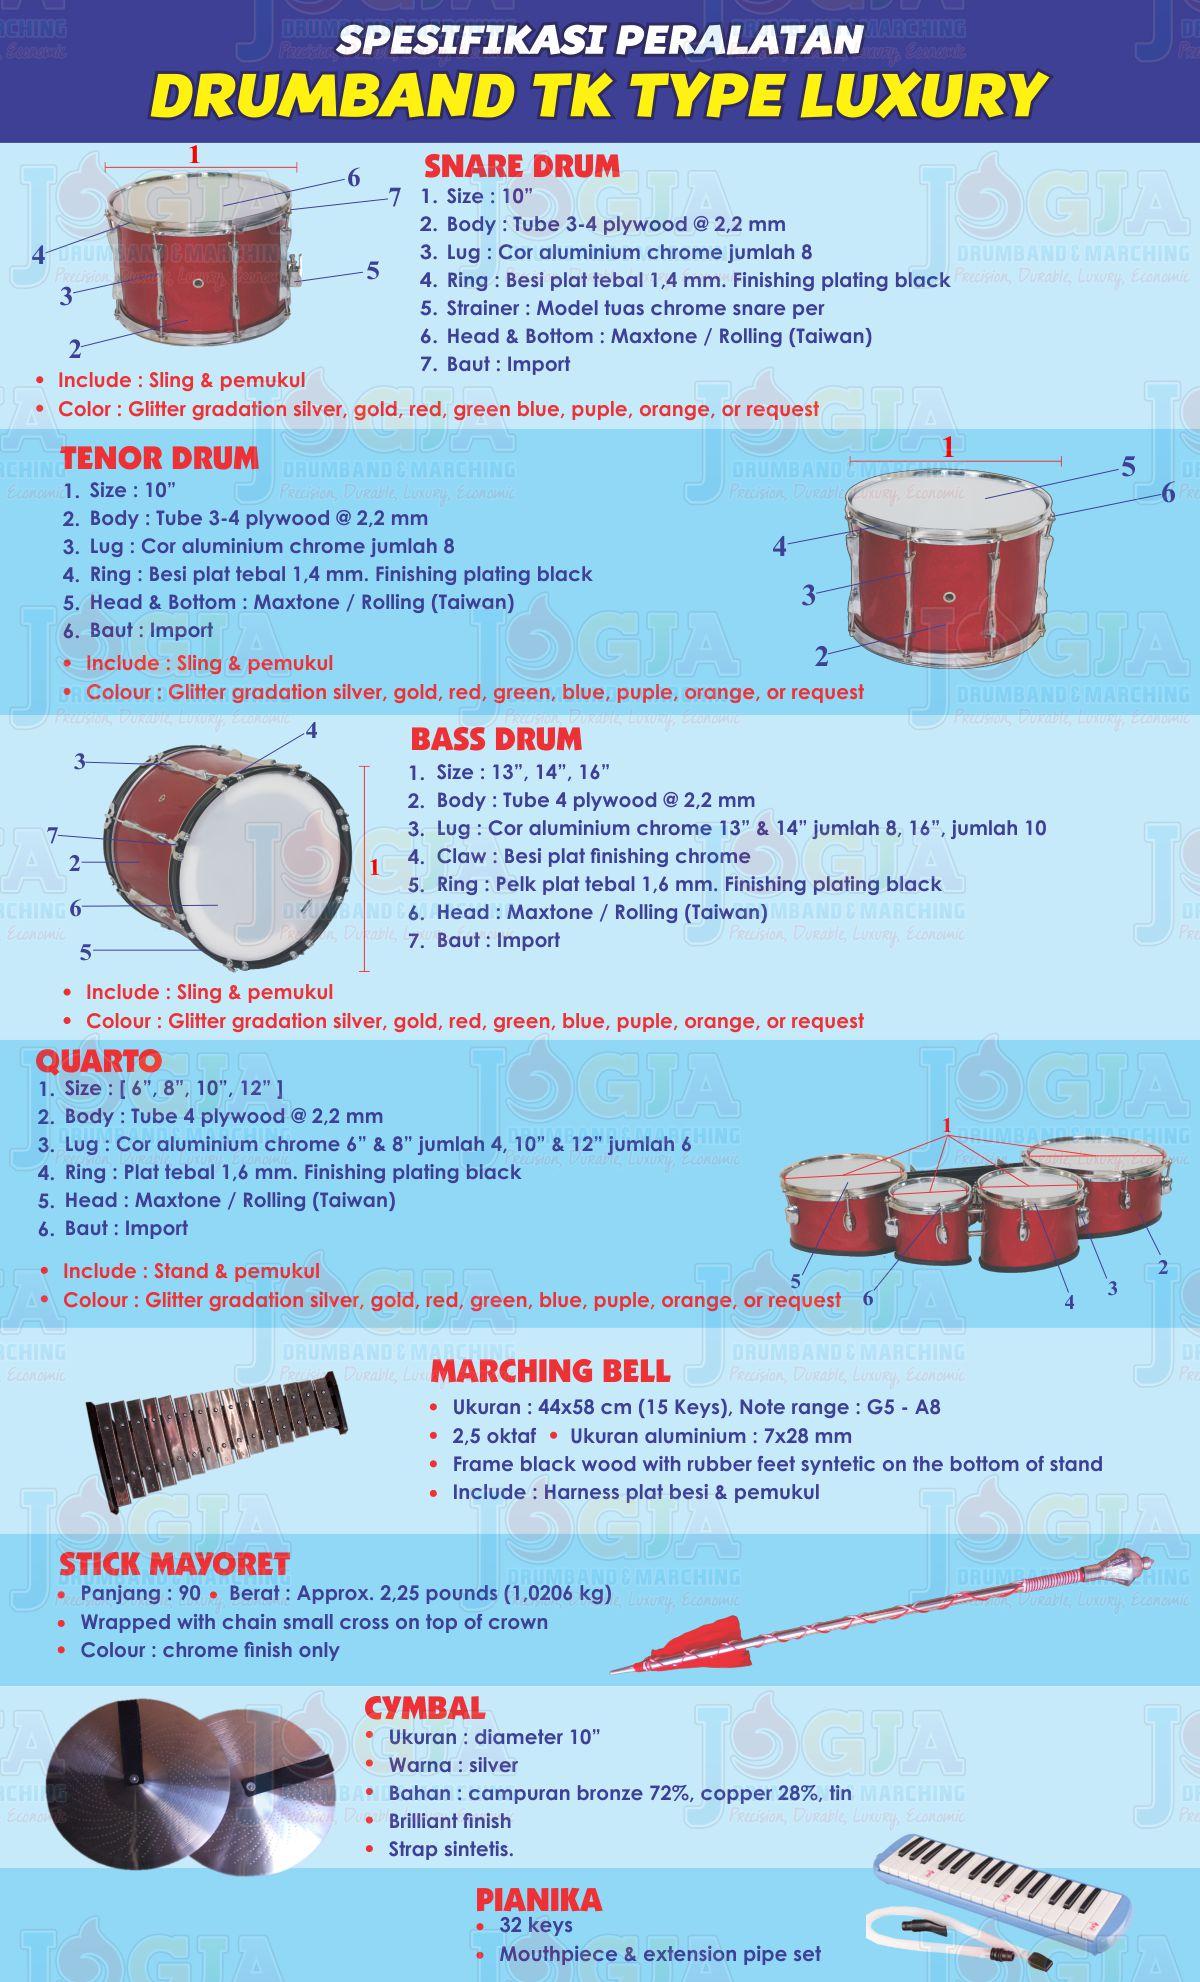 Spesifikasi Drumband TK